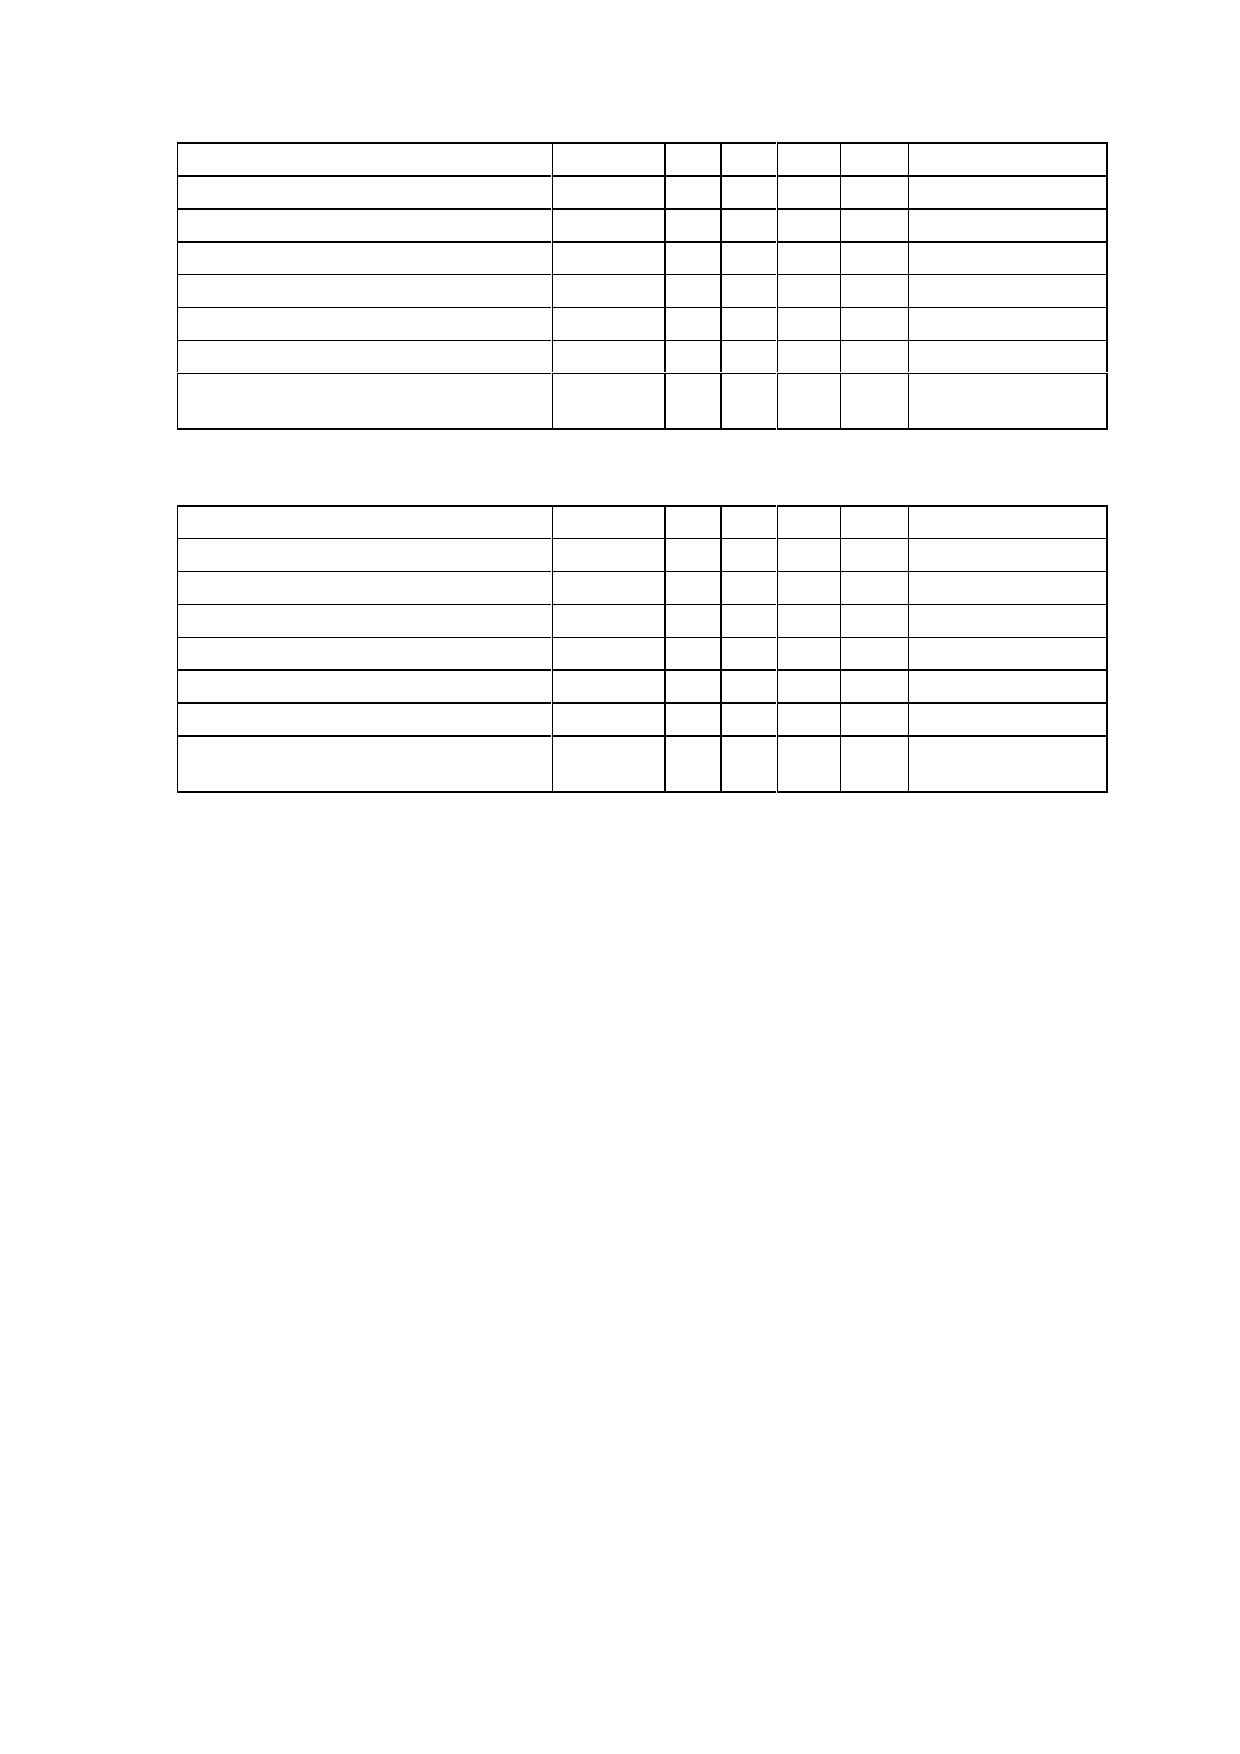 WCN3-0040HO-C11 pdf